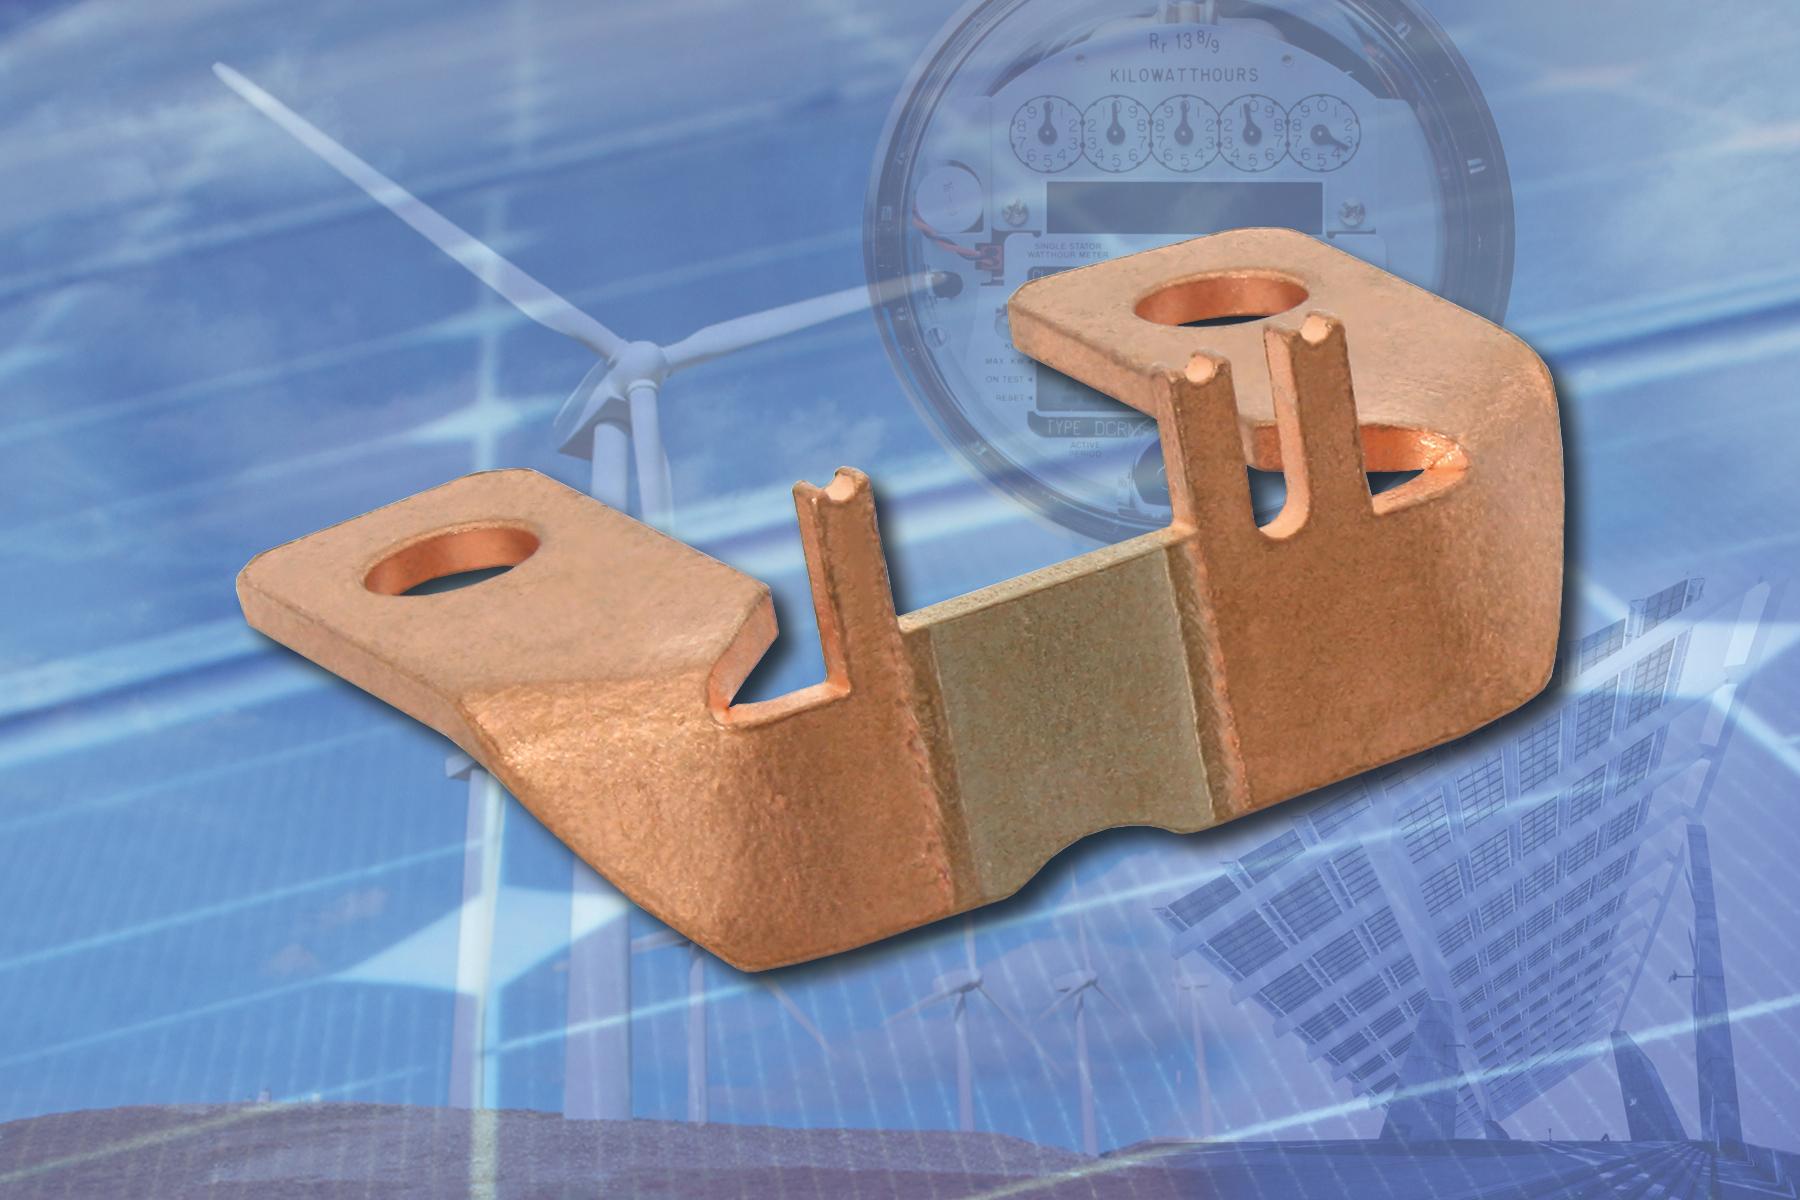 meter shunt resistor has 5  tolerance values